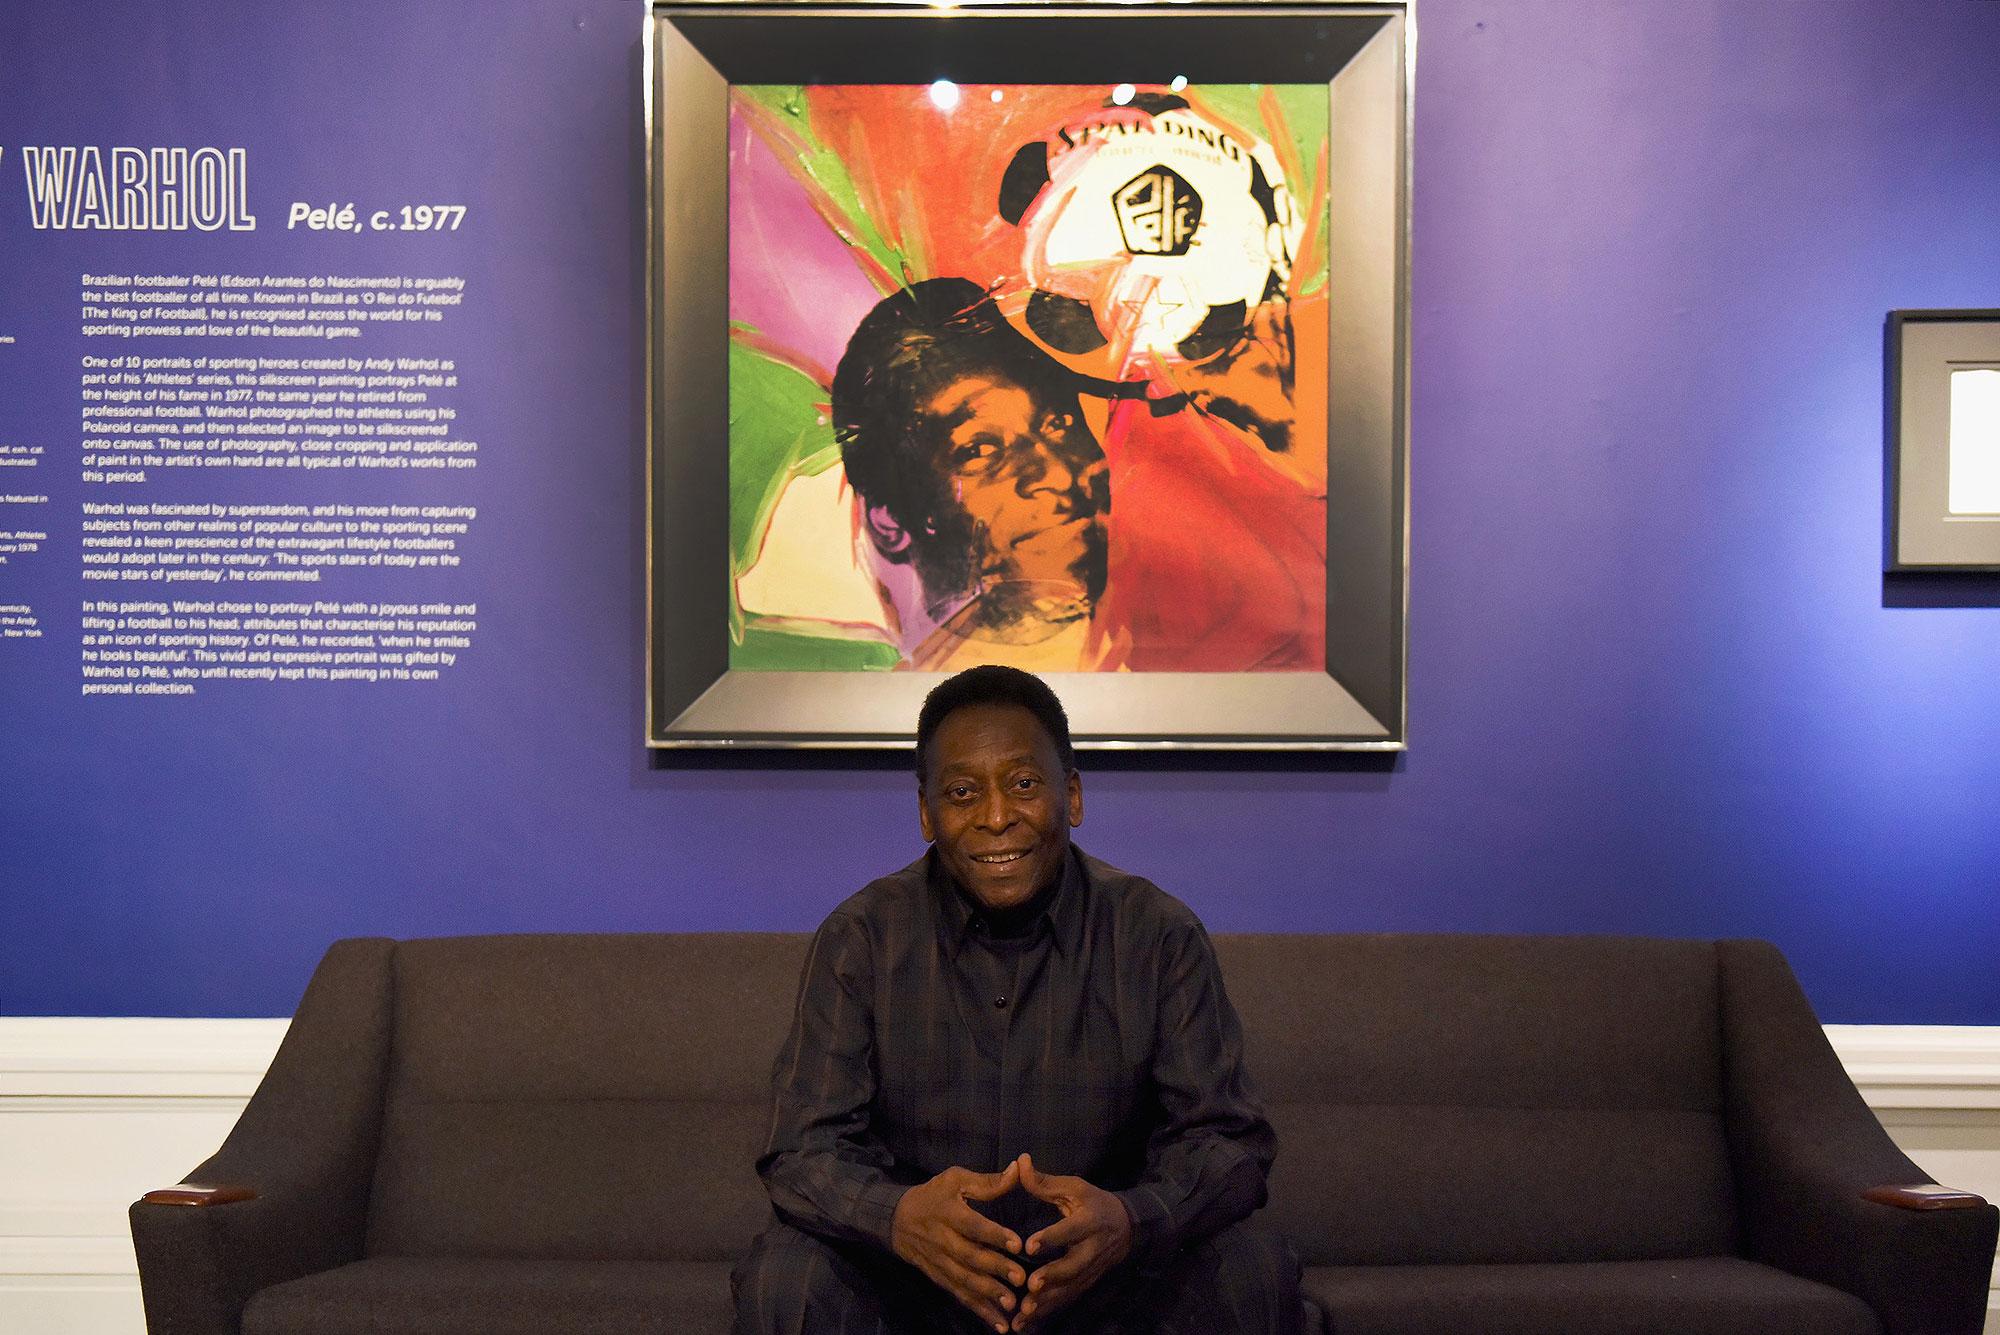 Warhol's original painting Pelé (1977)